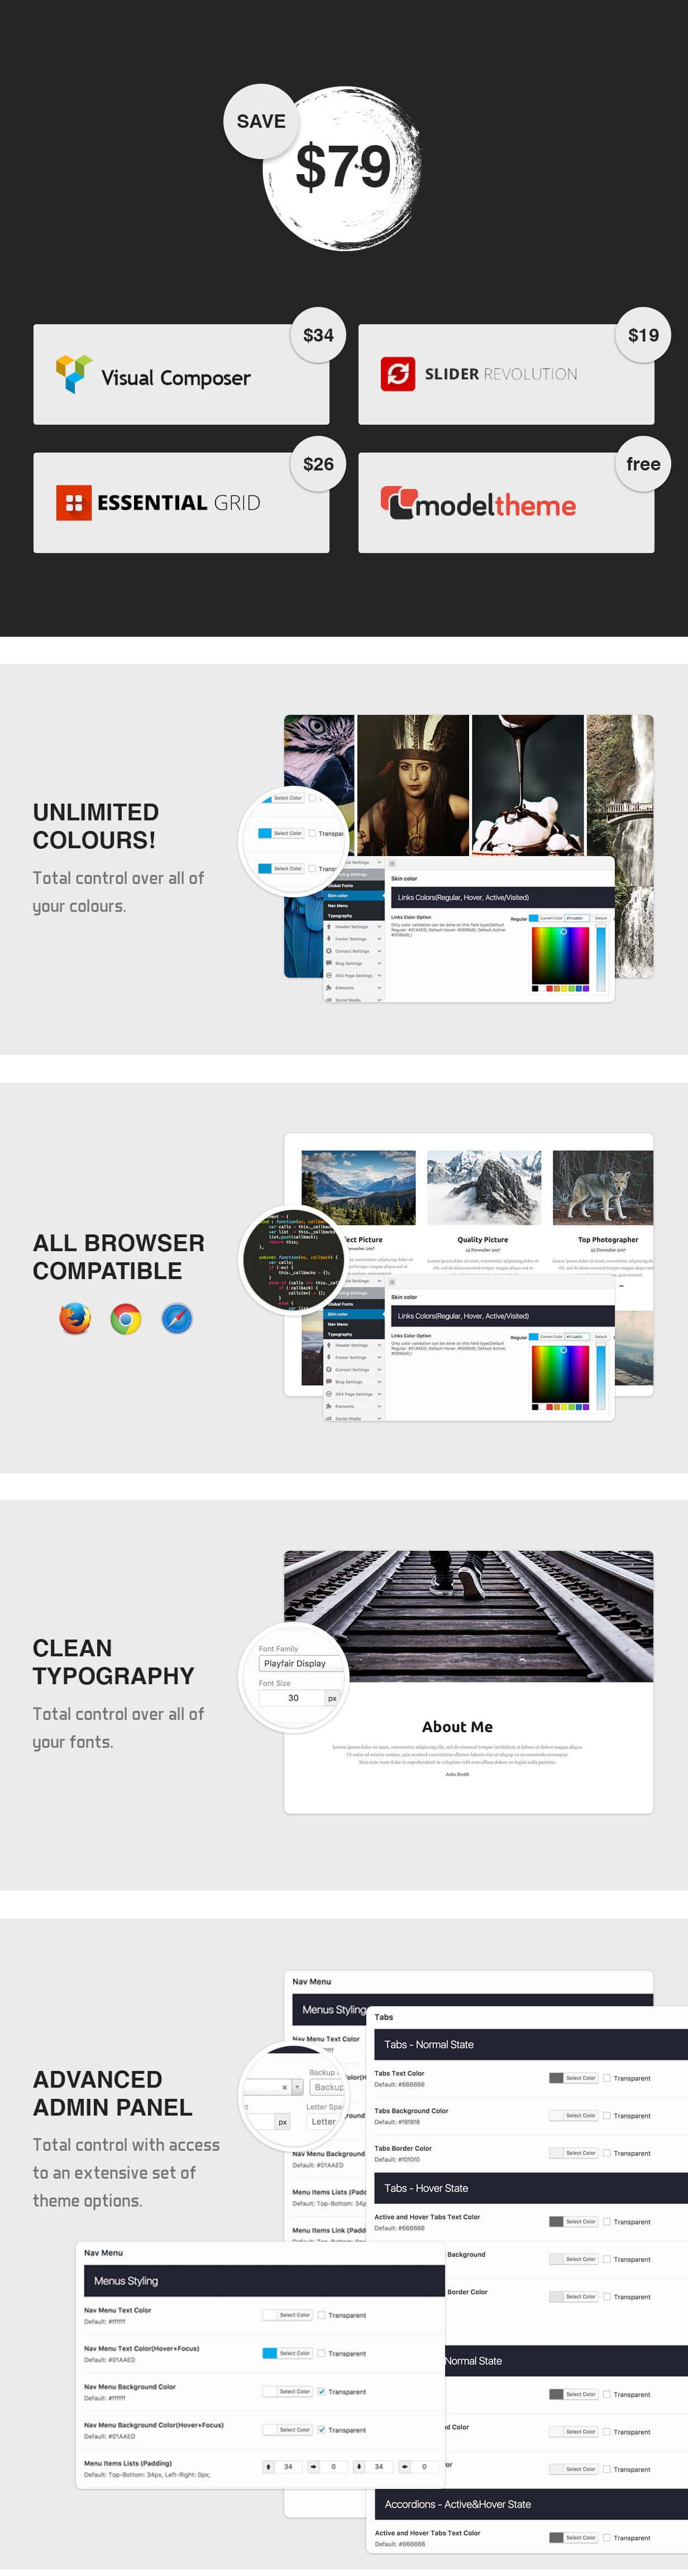 MT Photography - Eye-catching, Unique Photography WordPress Theme - 6